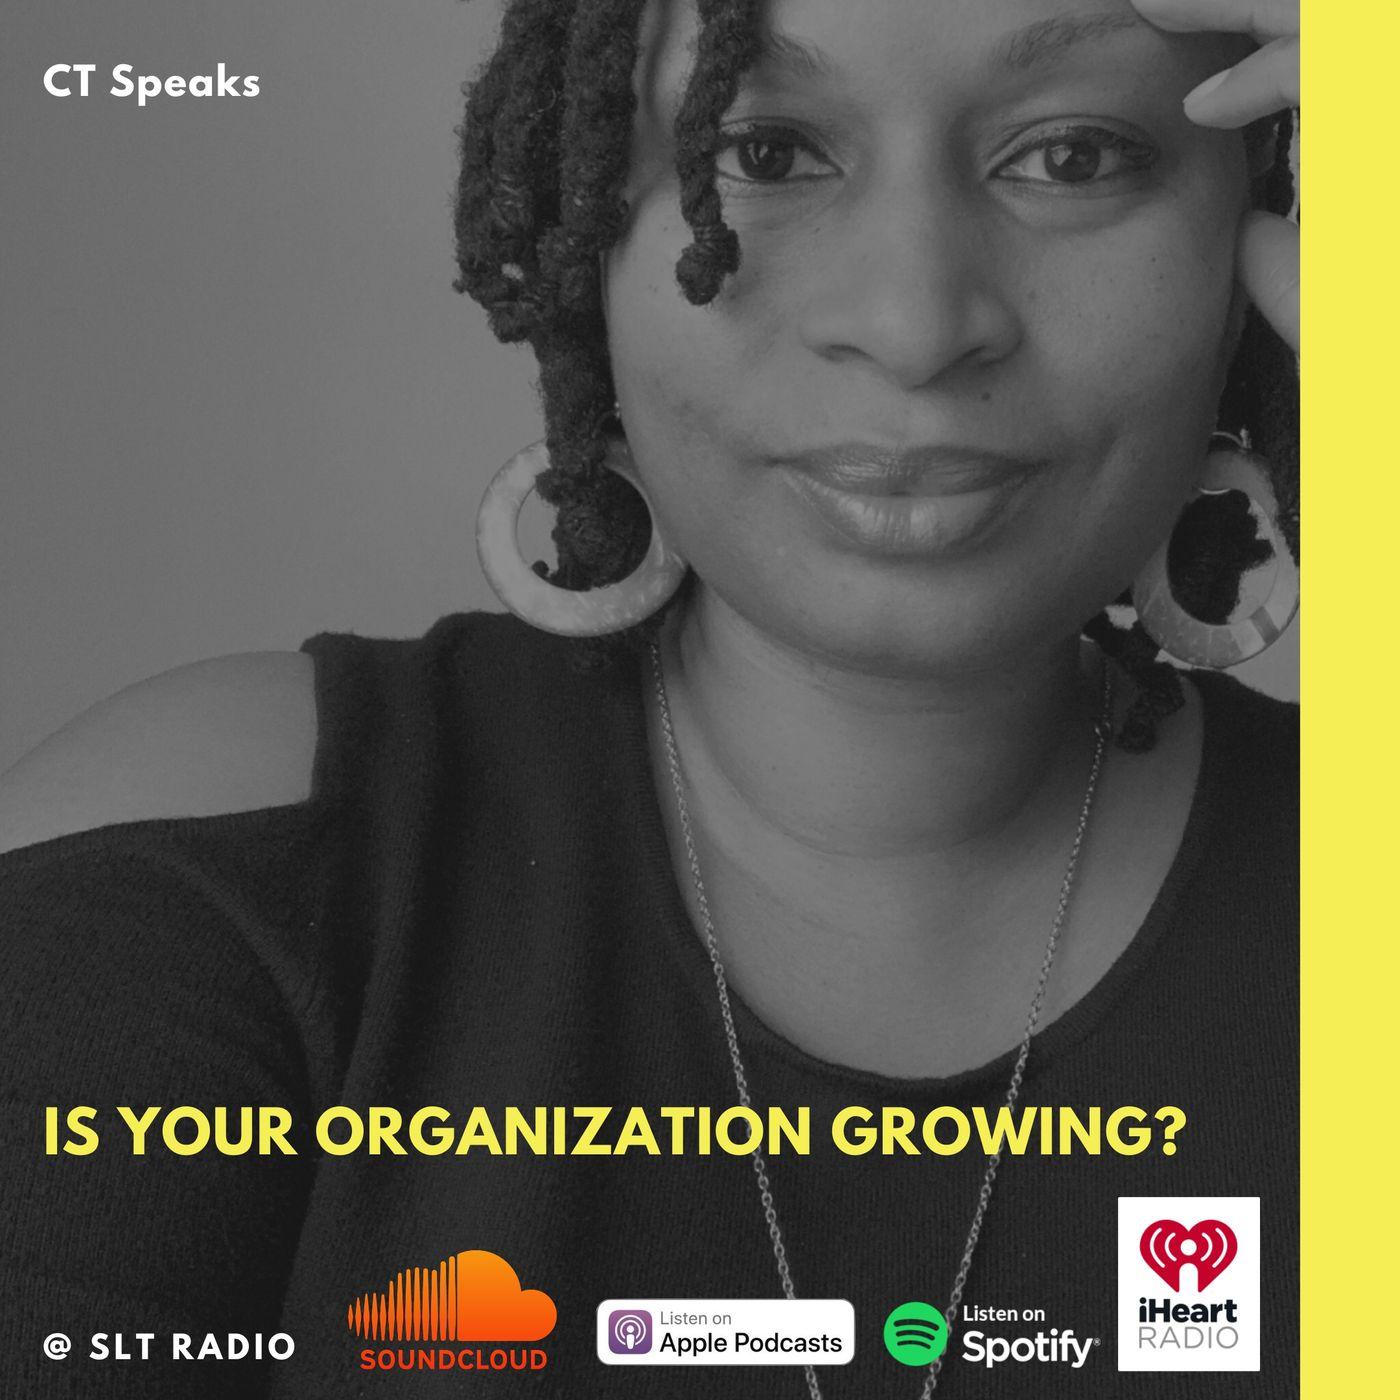 3.9 - GM2Leader - Is your organization growing? CT Speaks (Host)